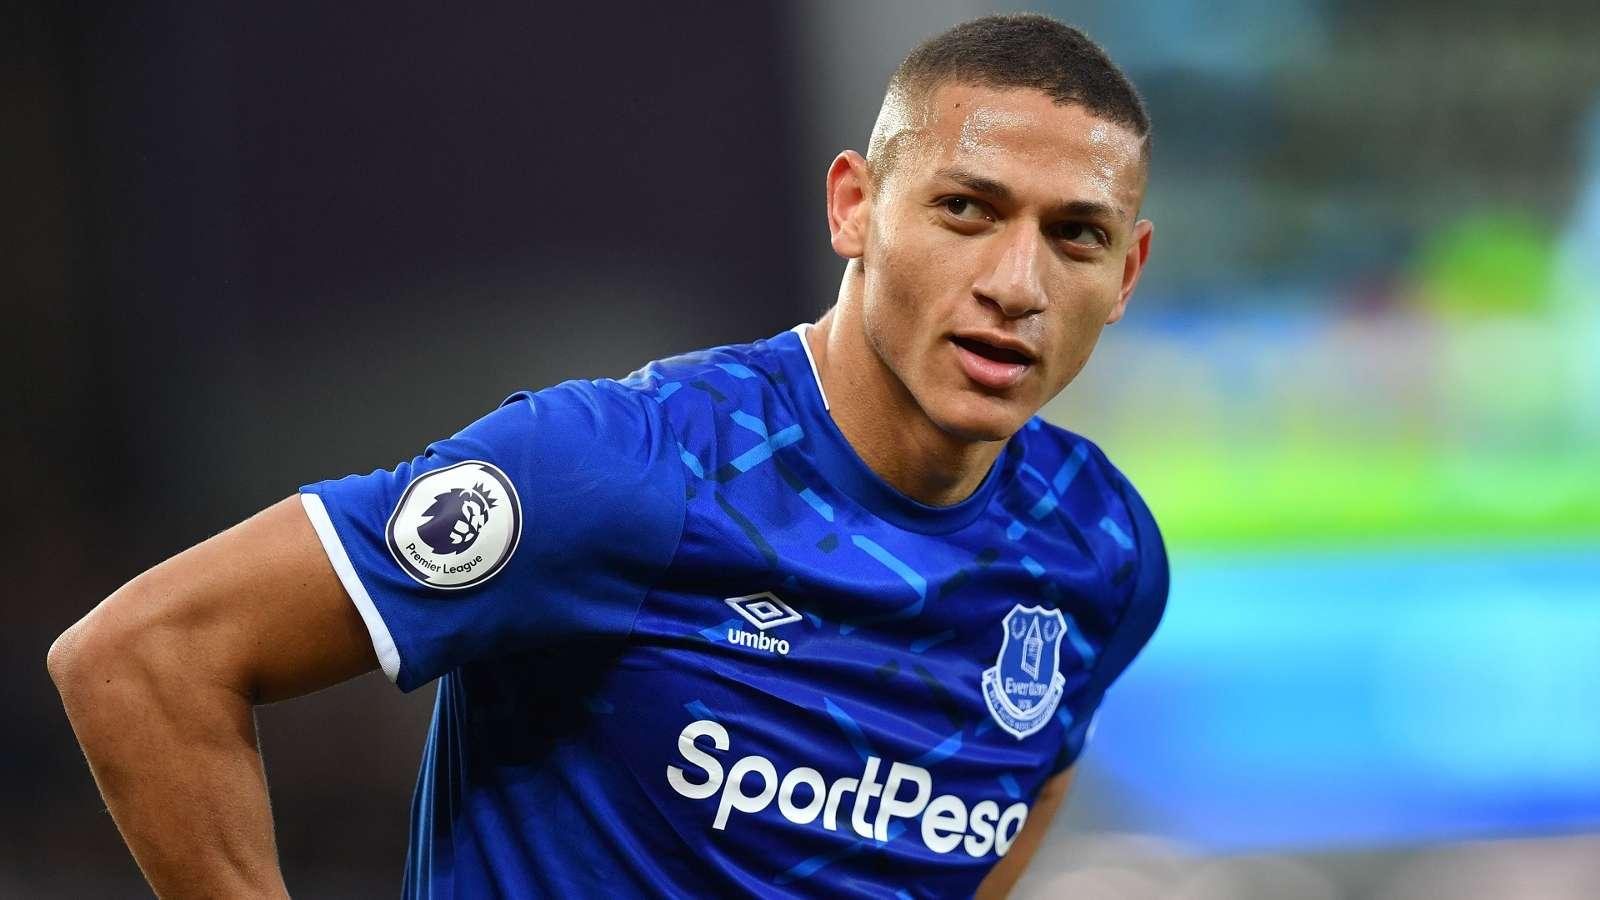 Richarlison Everton 2019-20